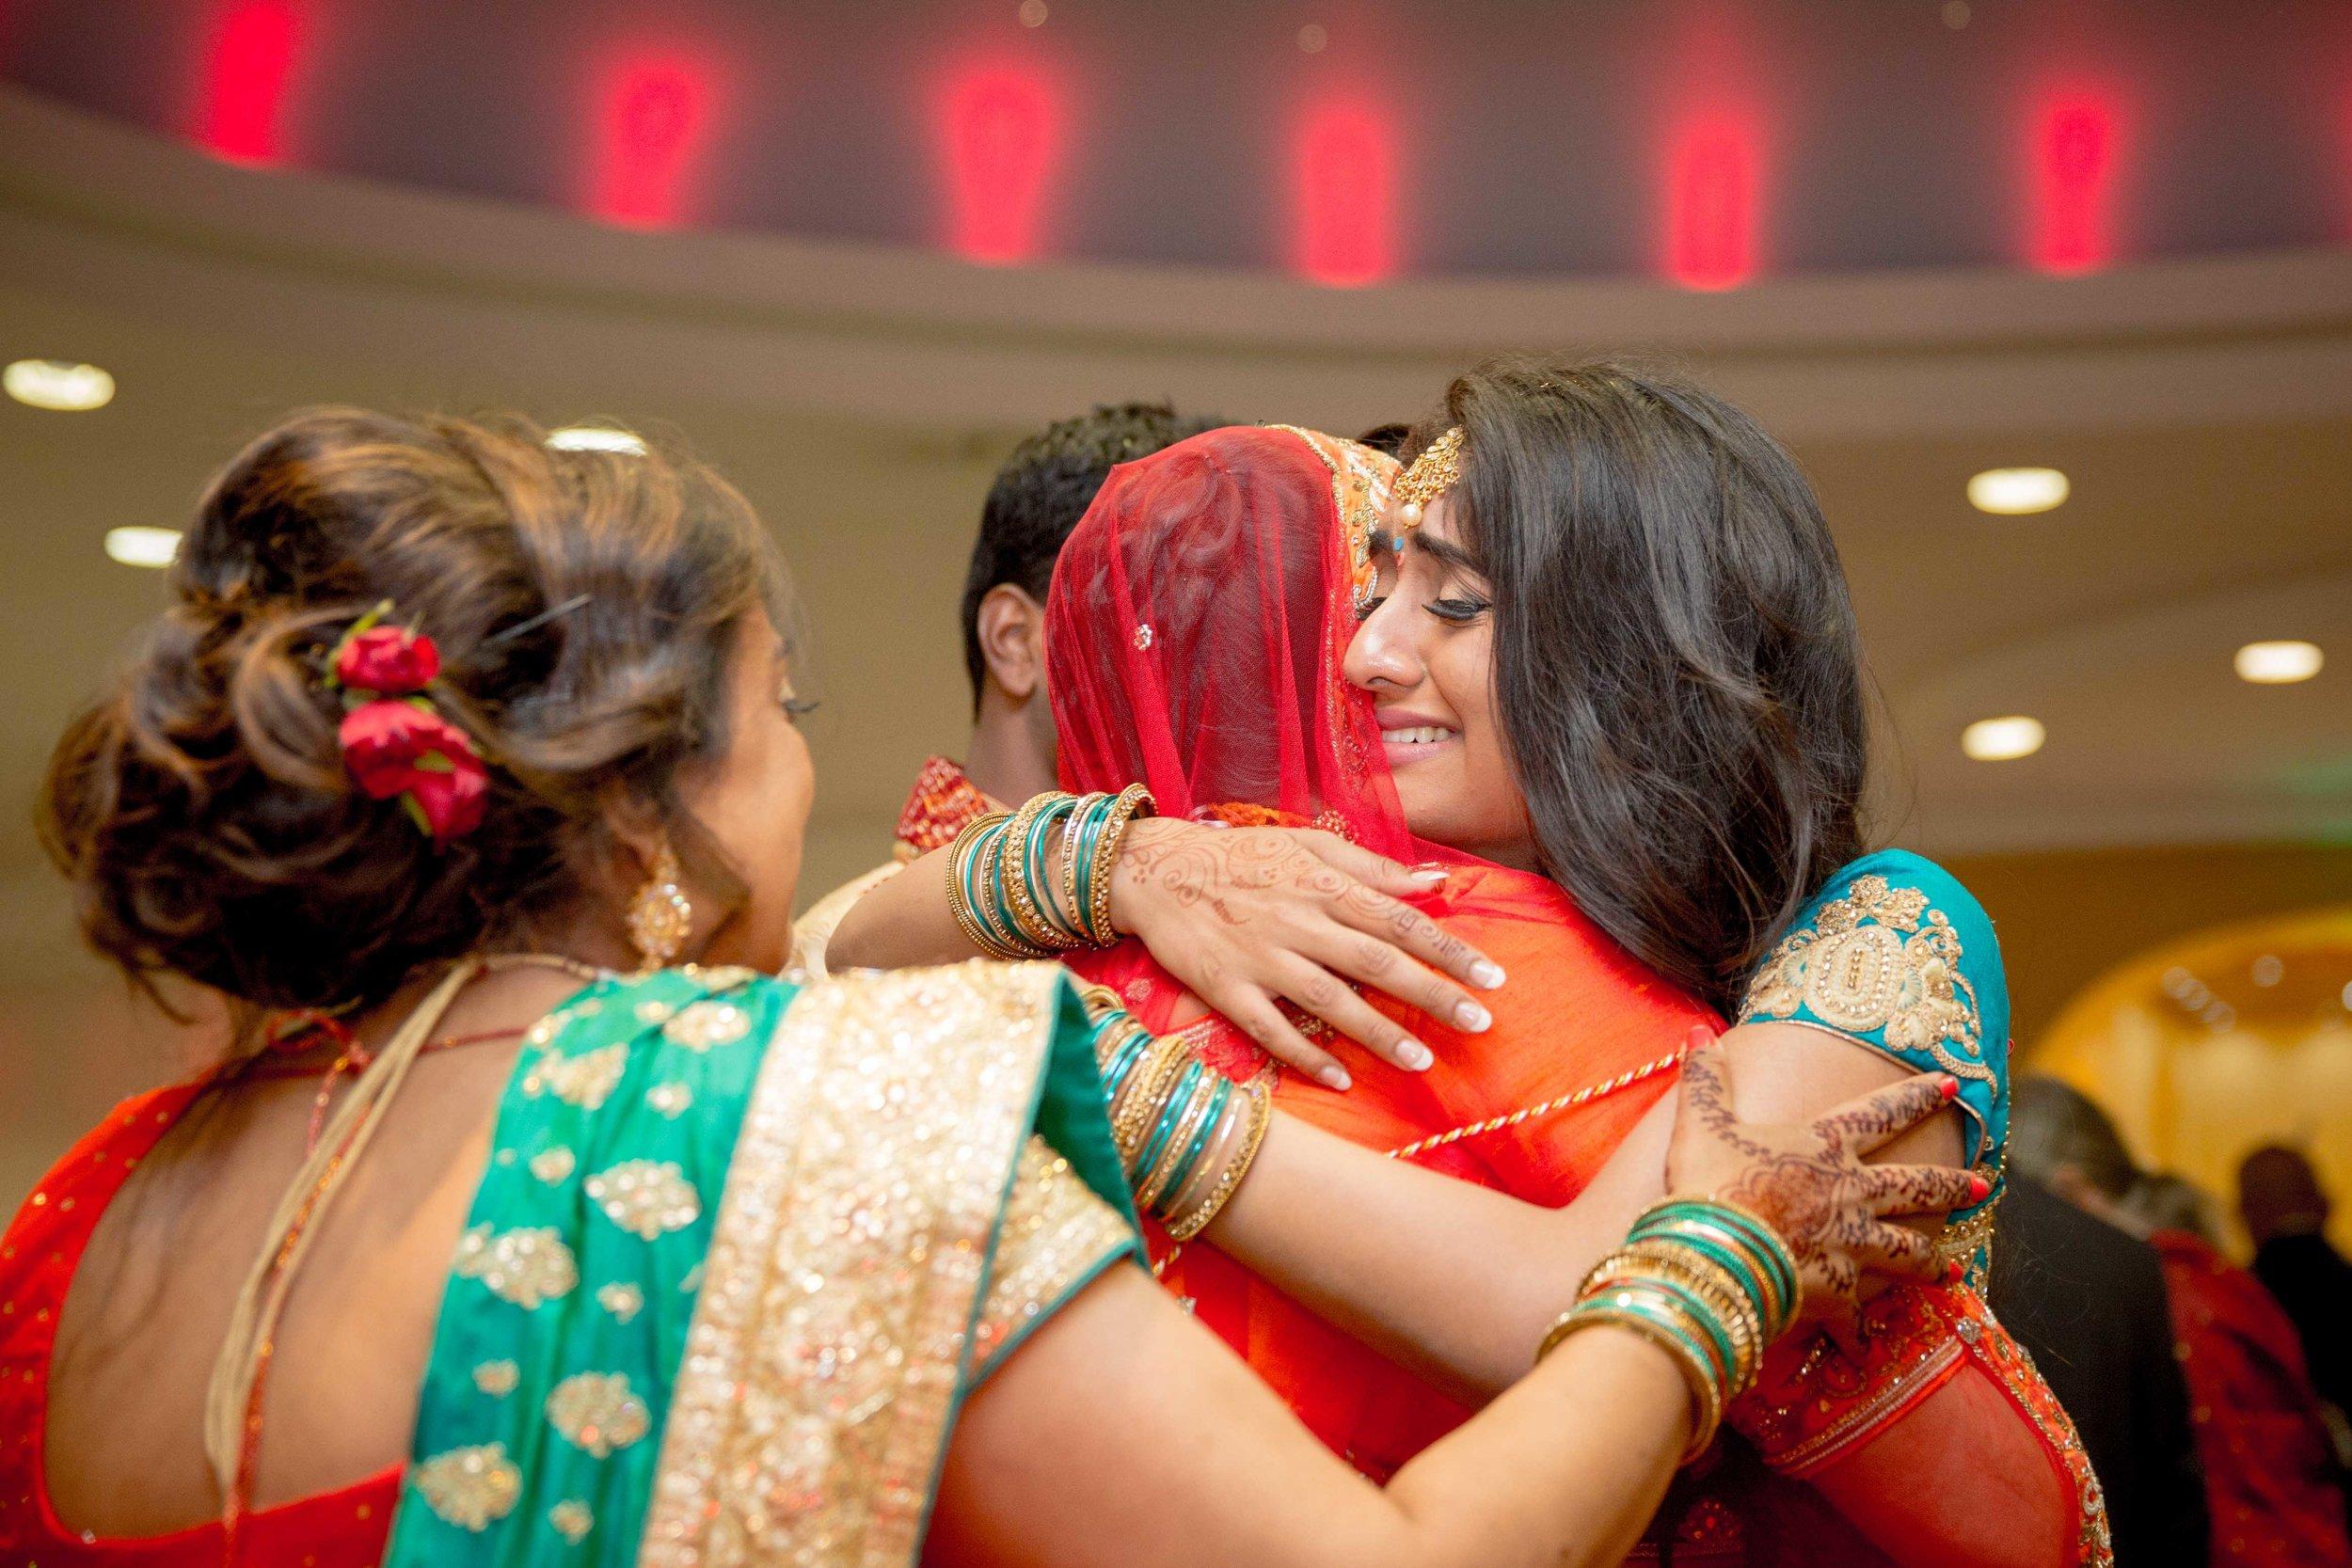 premier-banquetting-london-Hindu-asian-wedding-photographer-natalia-smith-photography-45.jpg